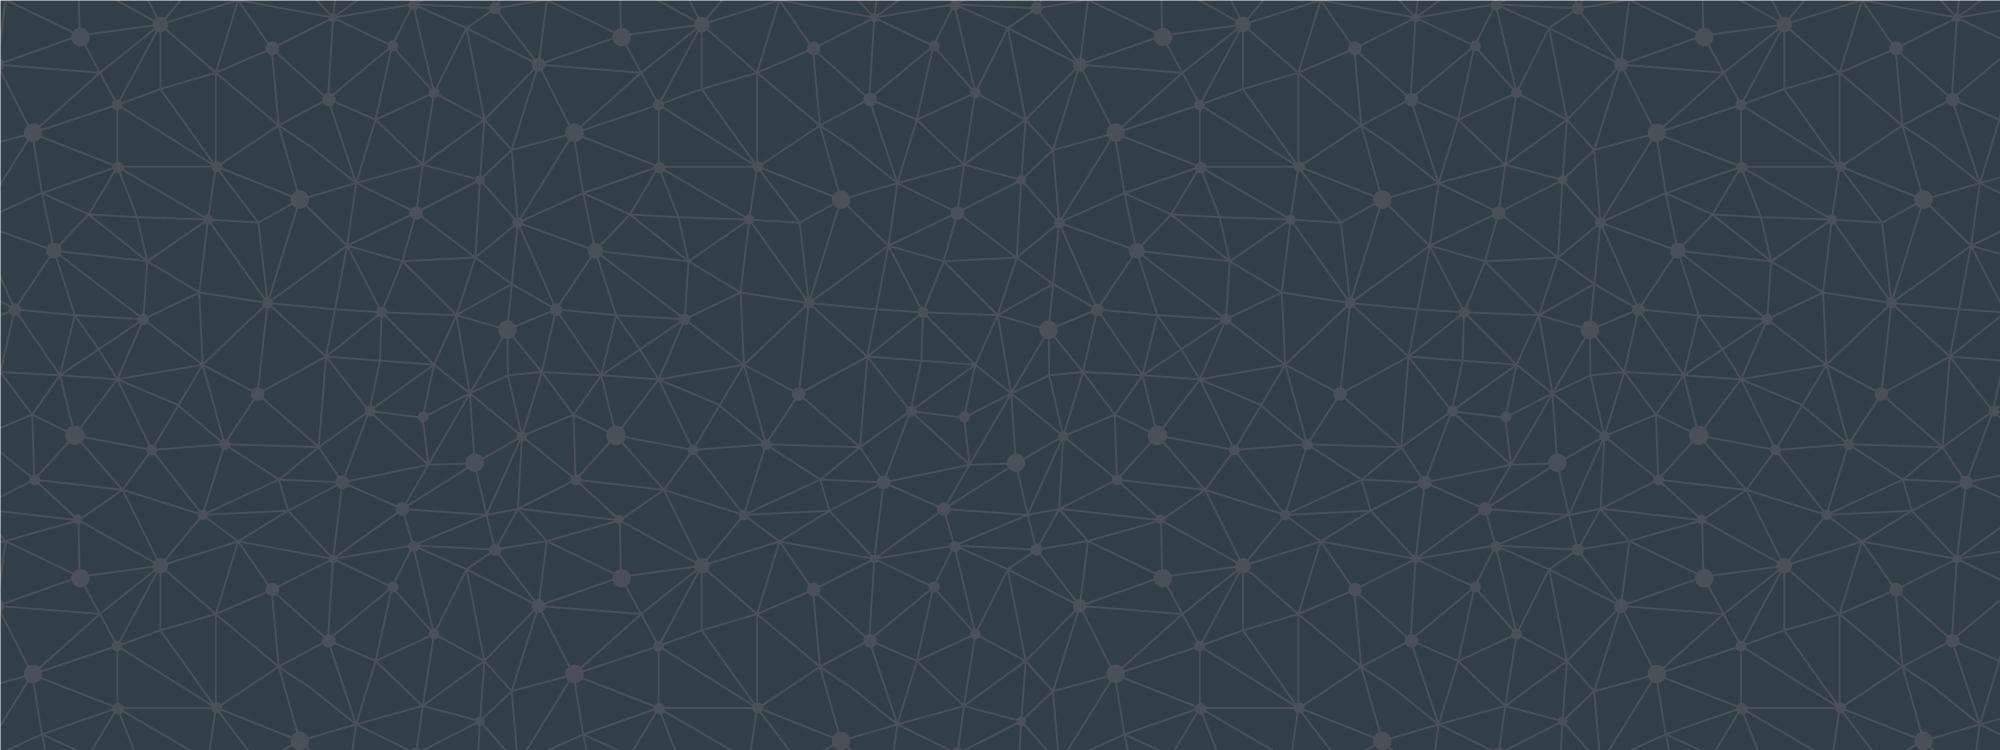 centrepoint_pattern